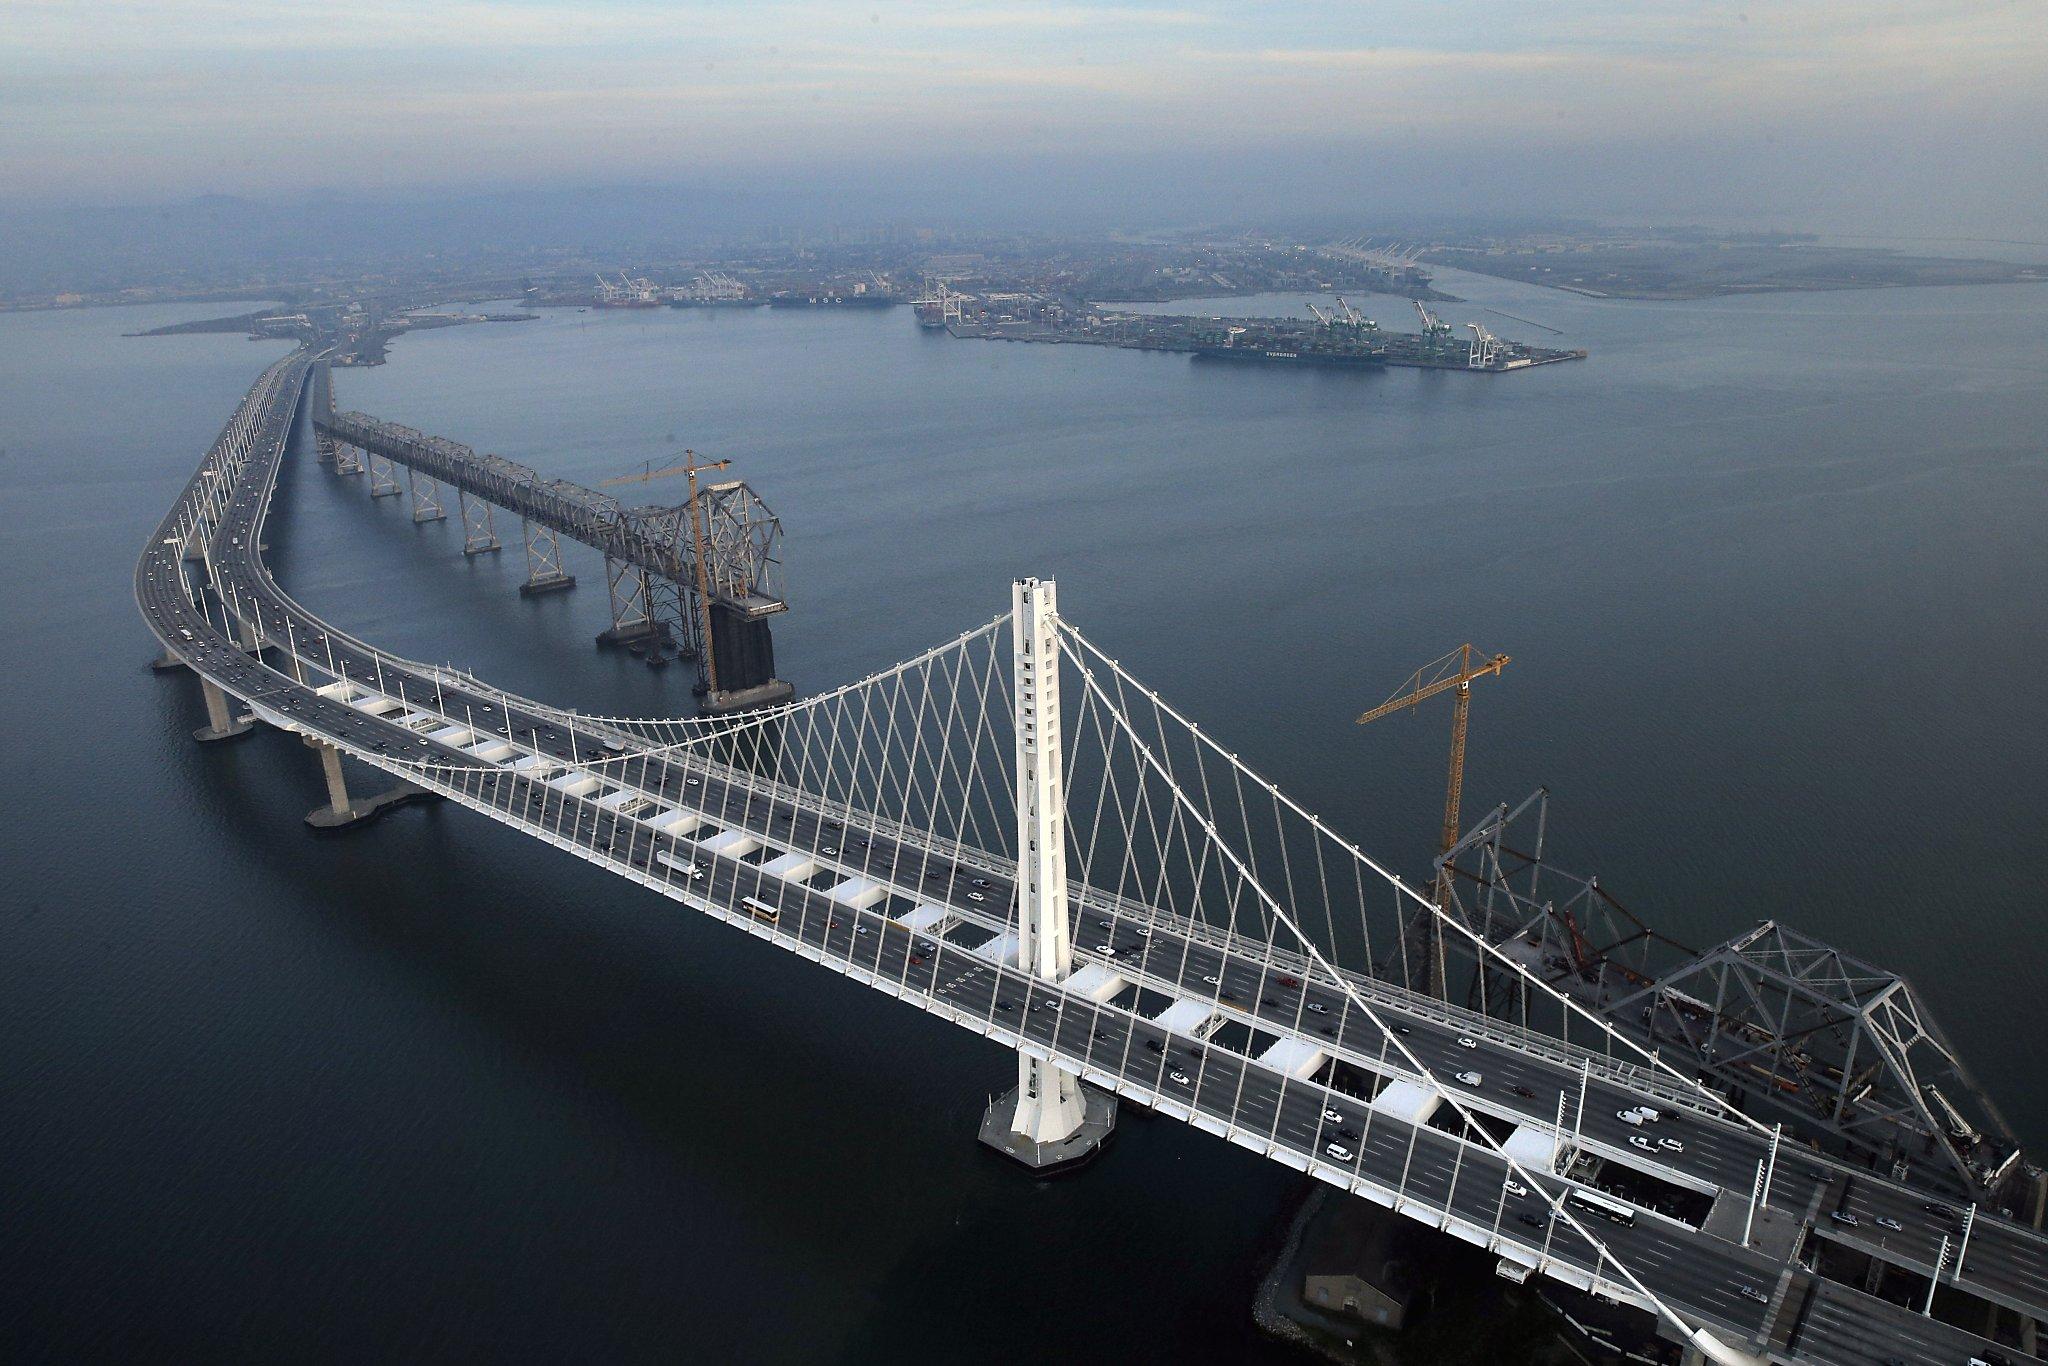 Bridge Protection in Catastrophic Earthquakes